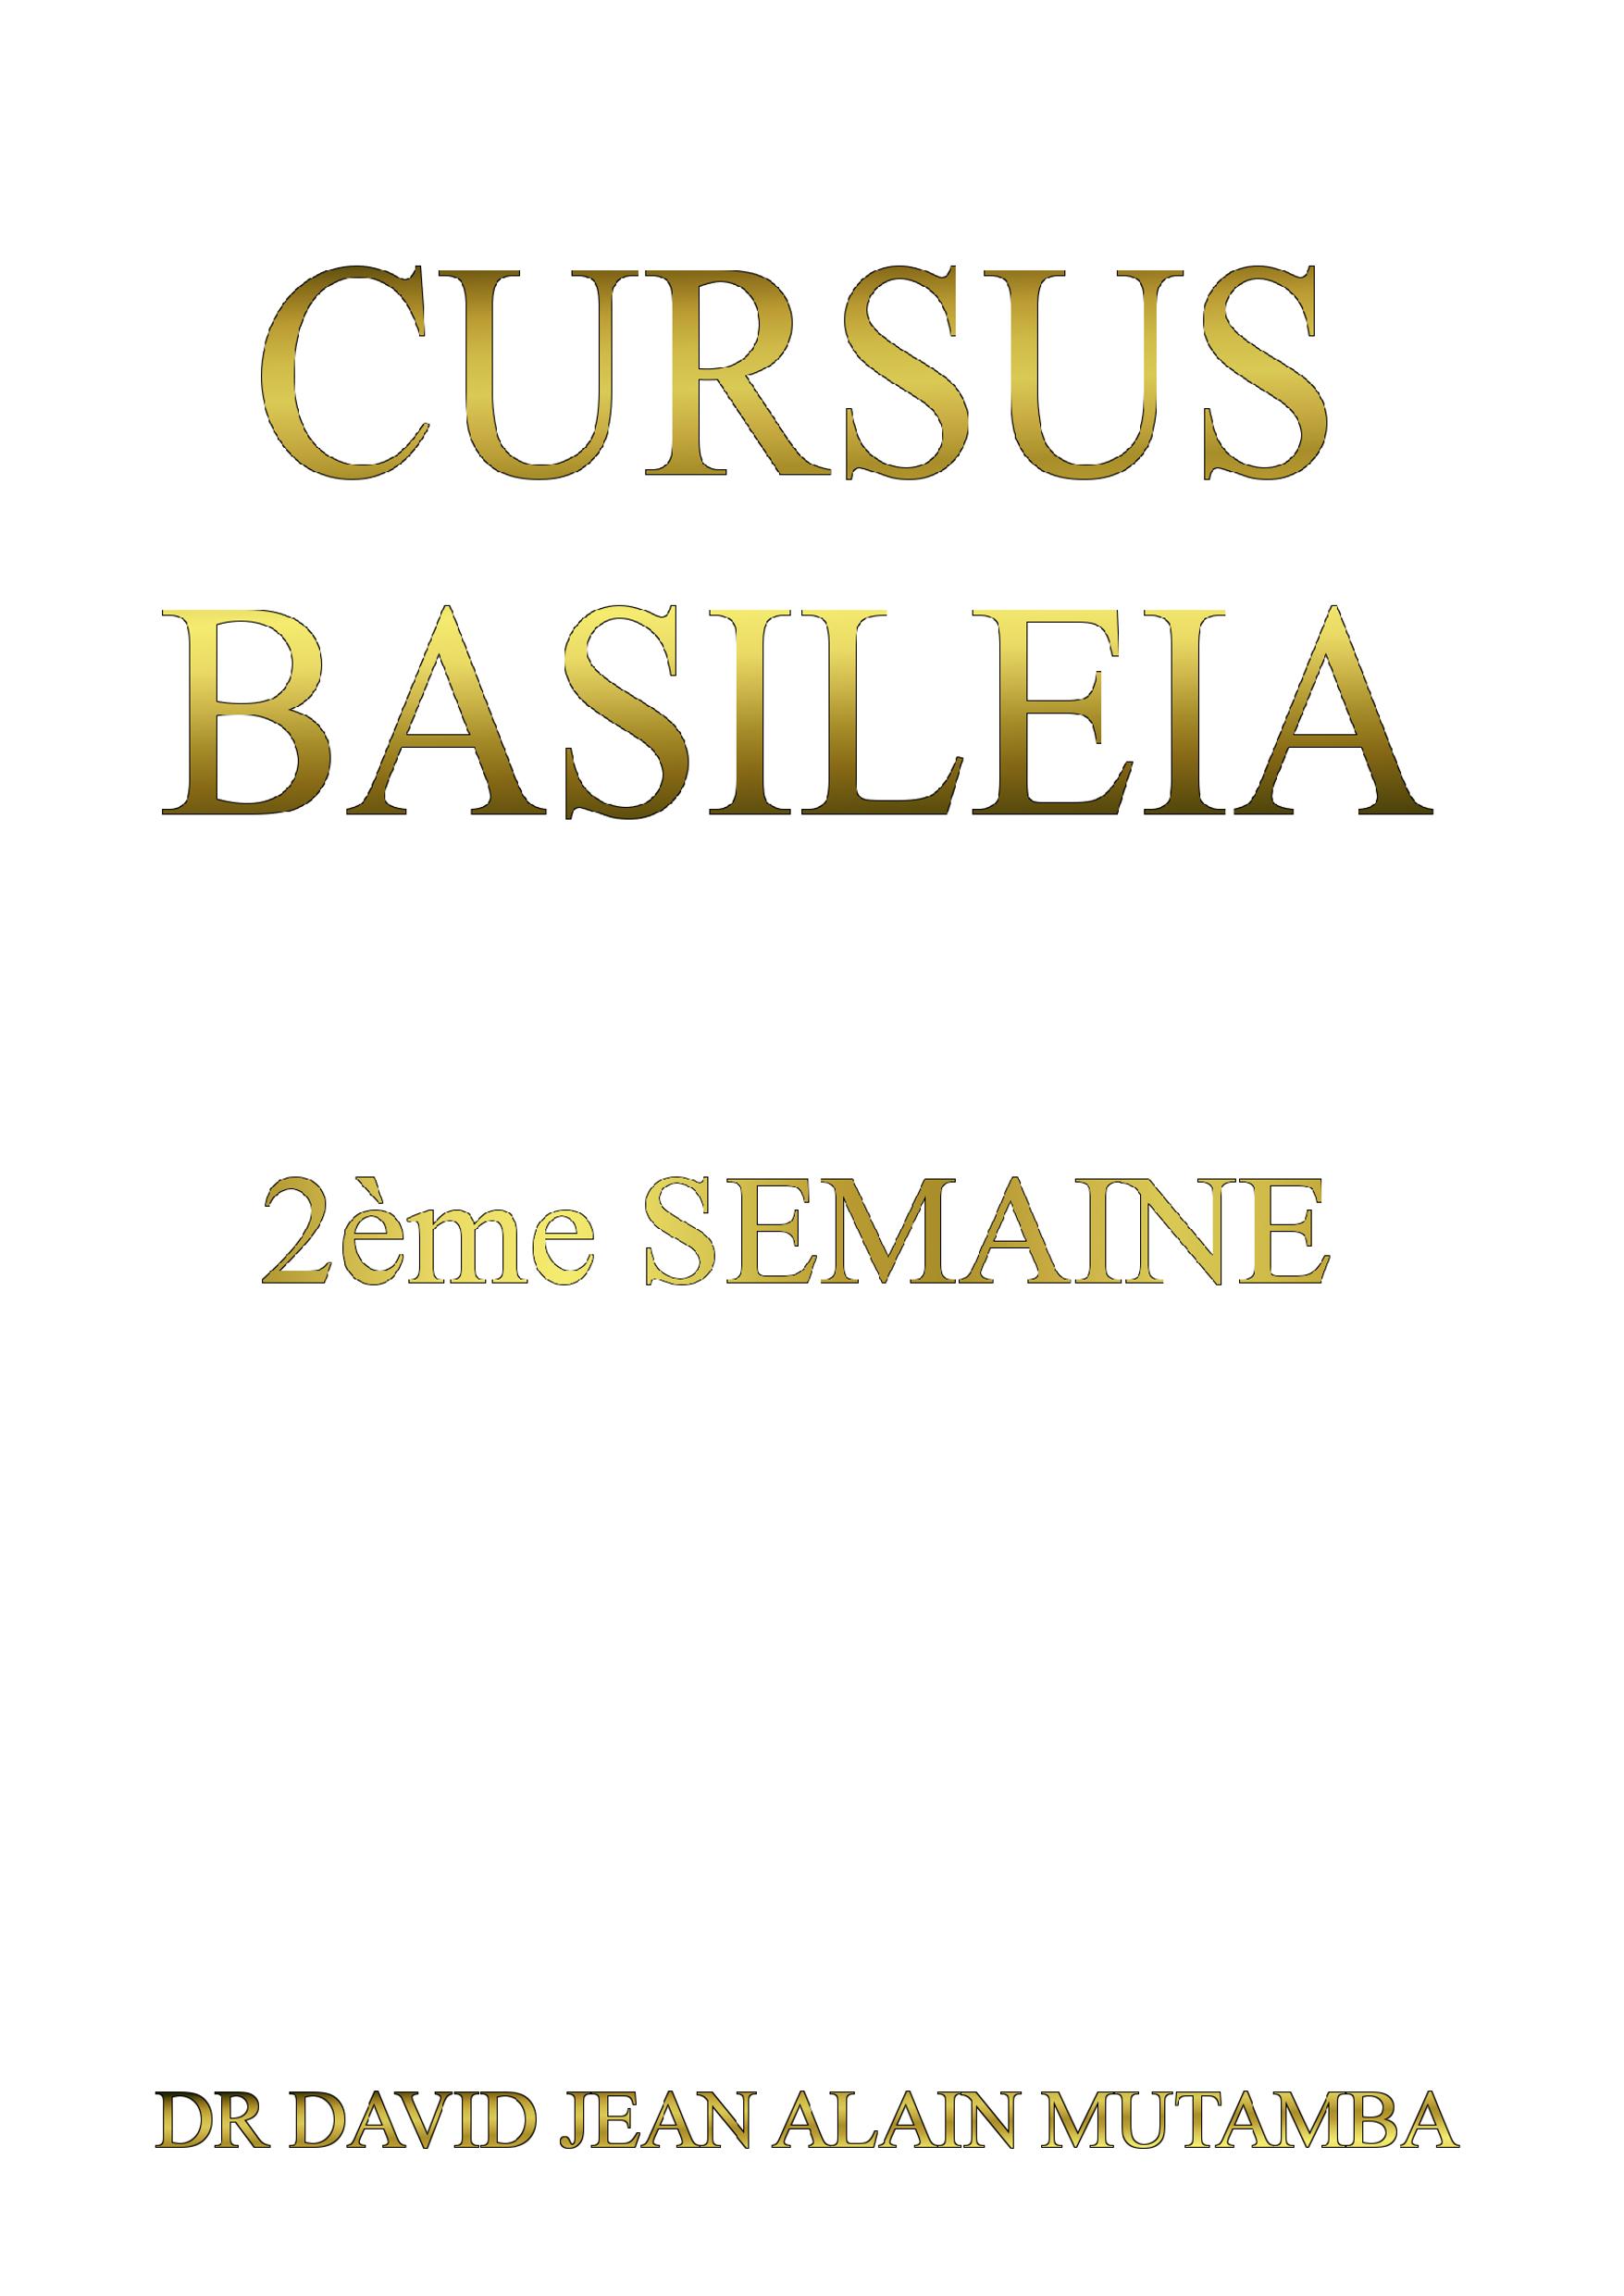 CURSUS BASILEIA 2ème Semaine